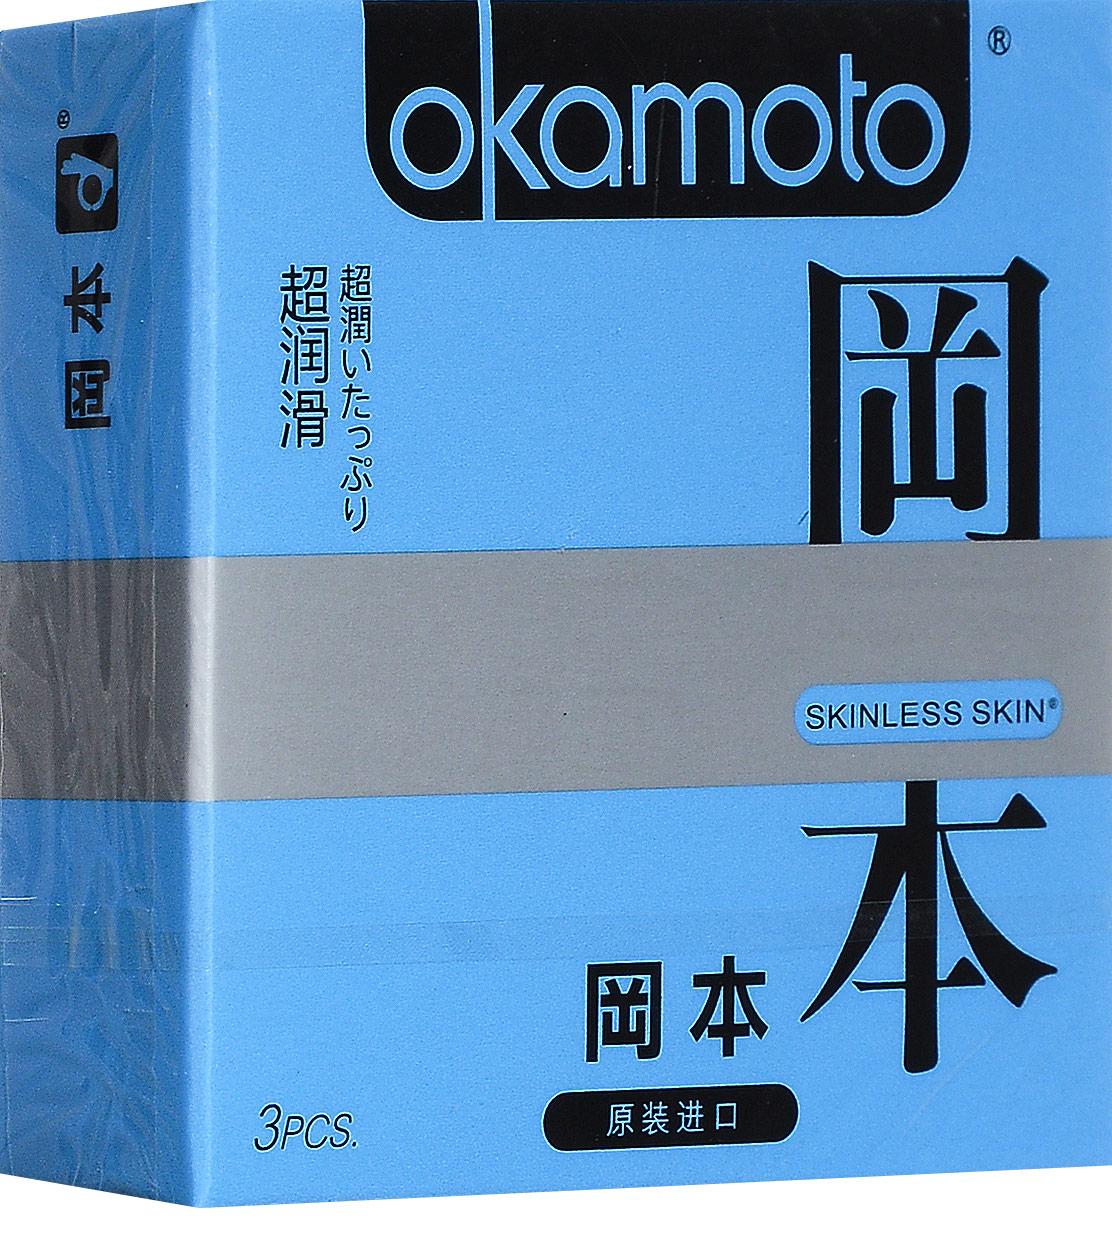 Презервативы Okamоto Skinless Skin Super Lubricative 3 шт c обильной смазкой